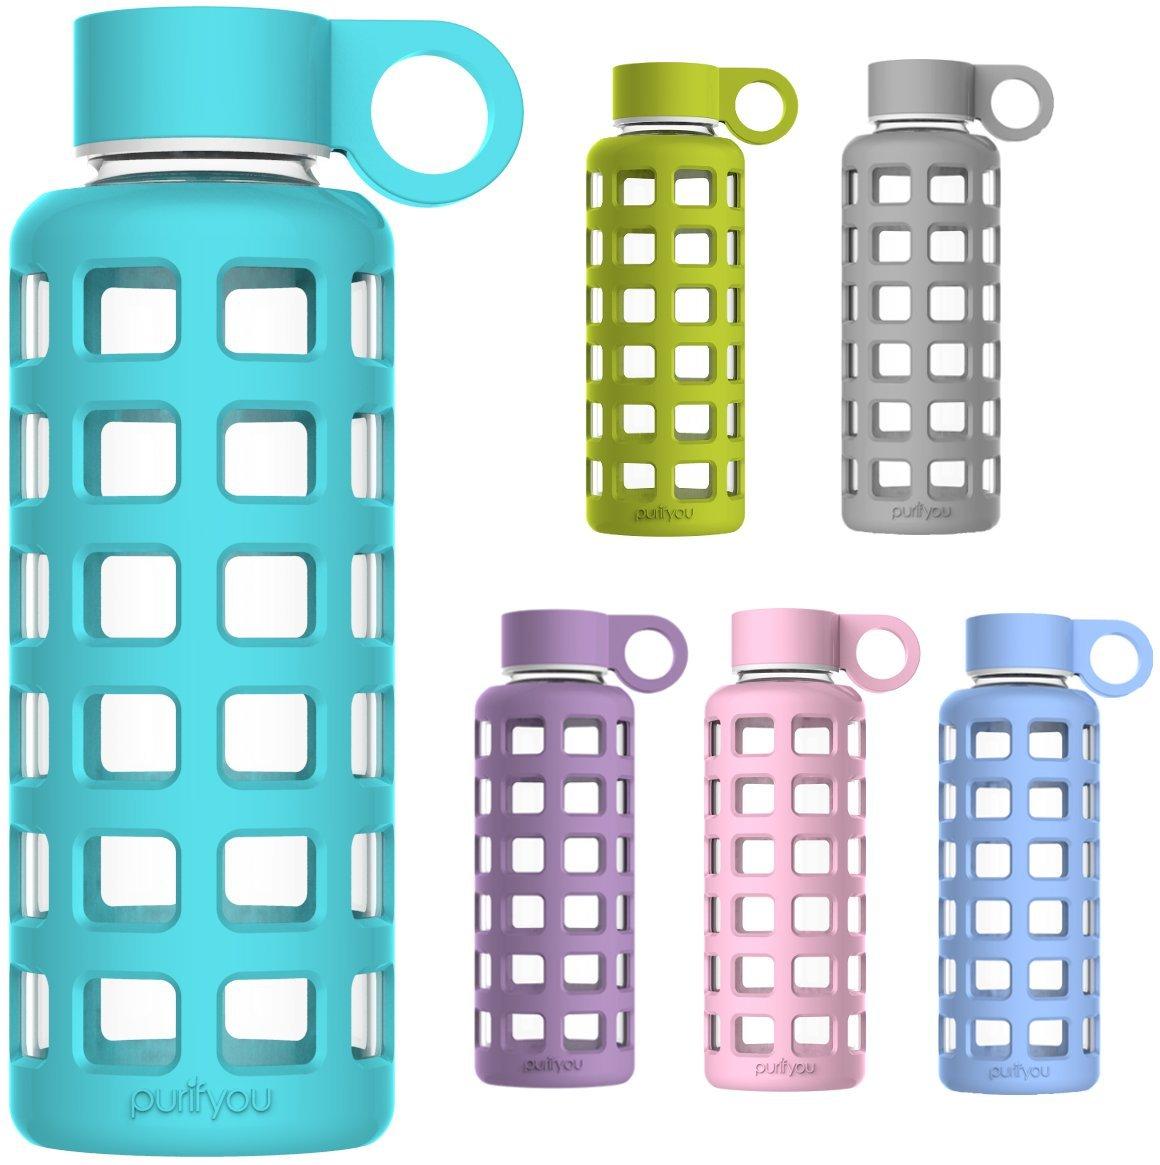 Purifyou Premium Glass Water Bottle - 32oz.